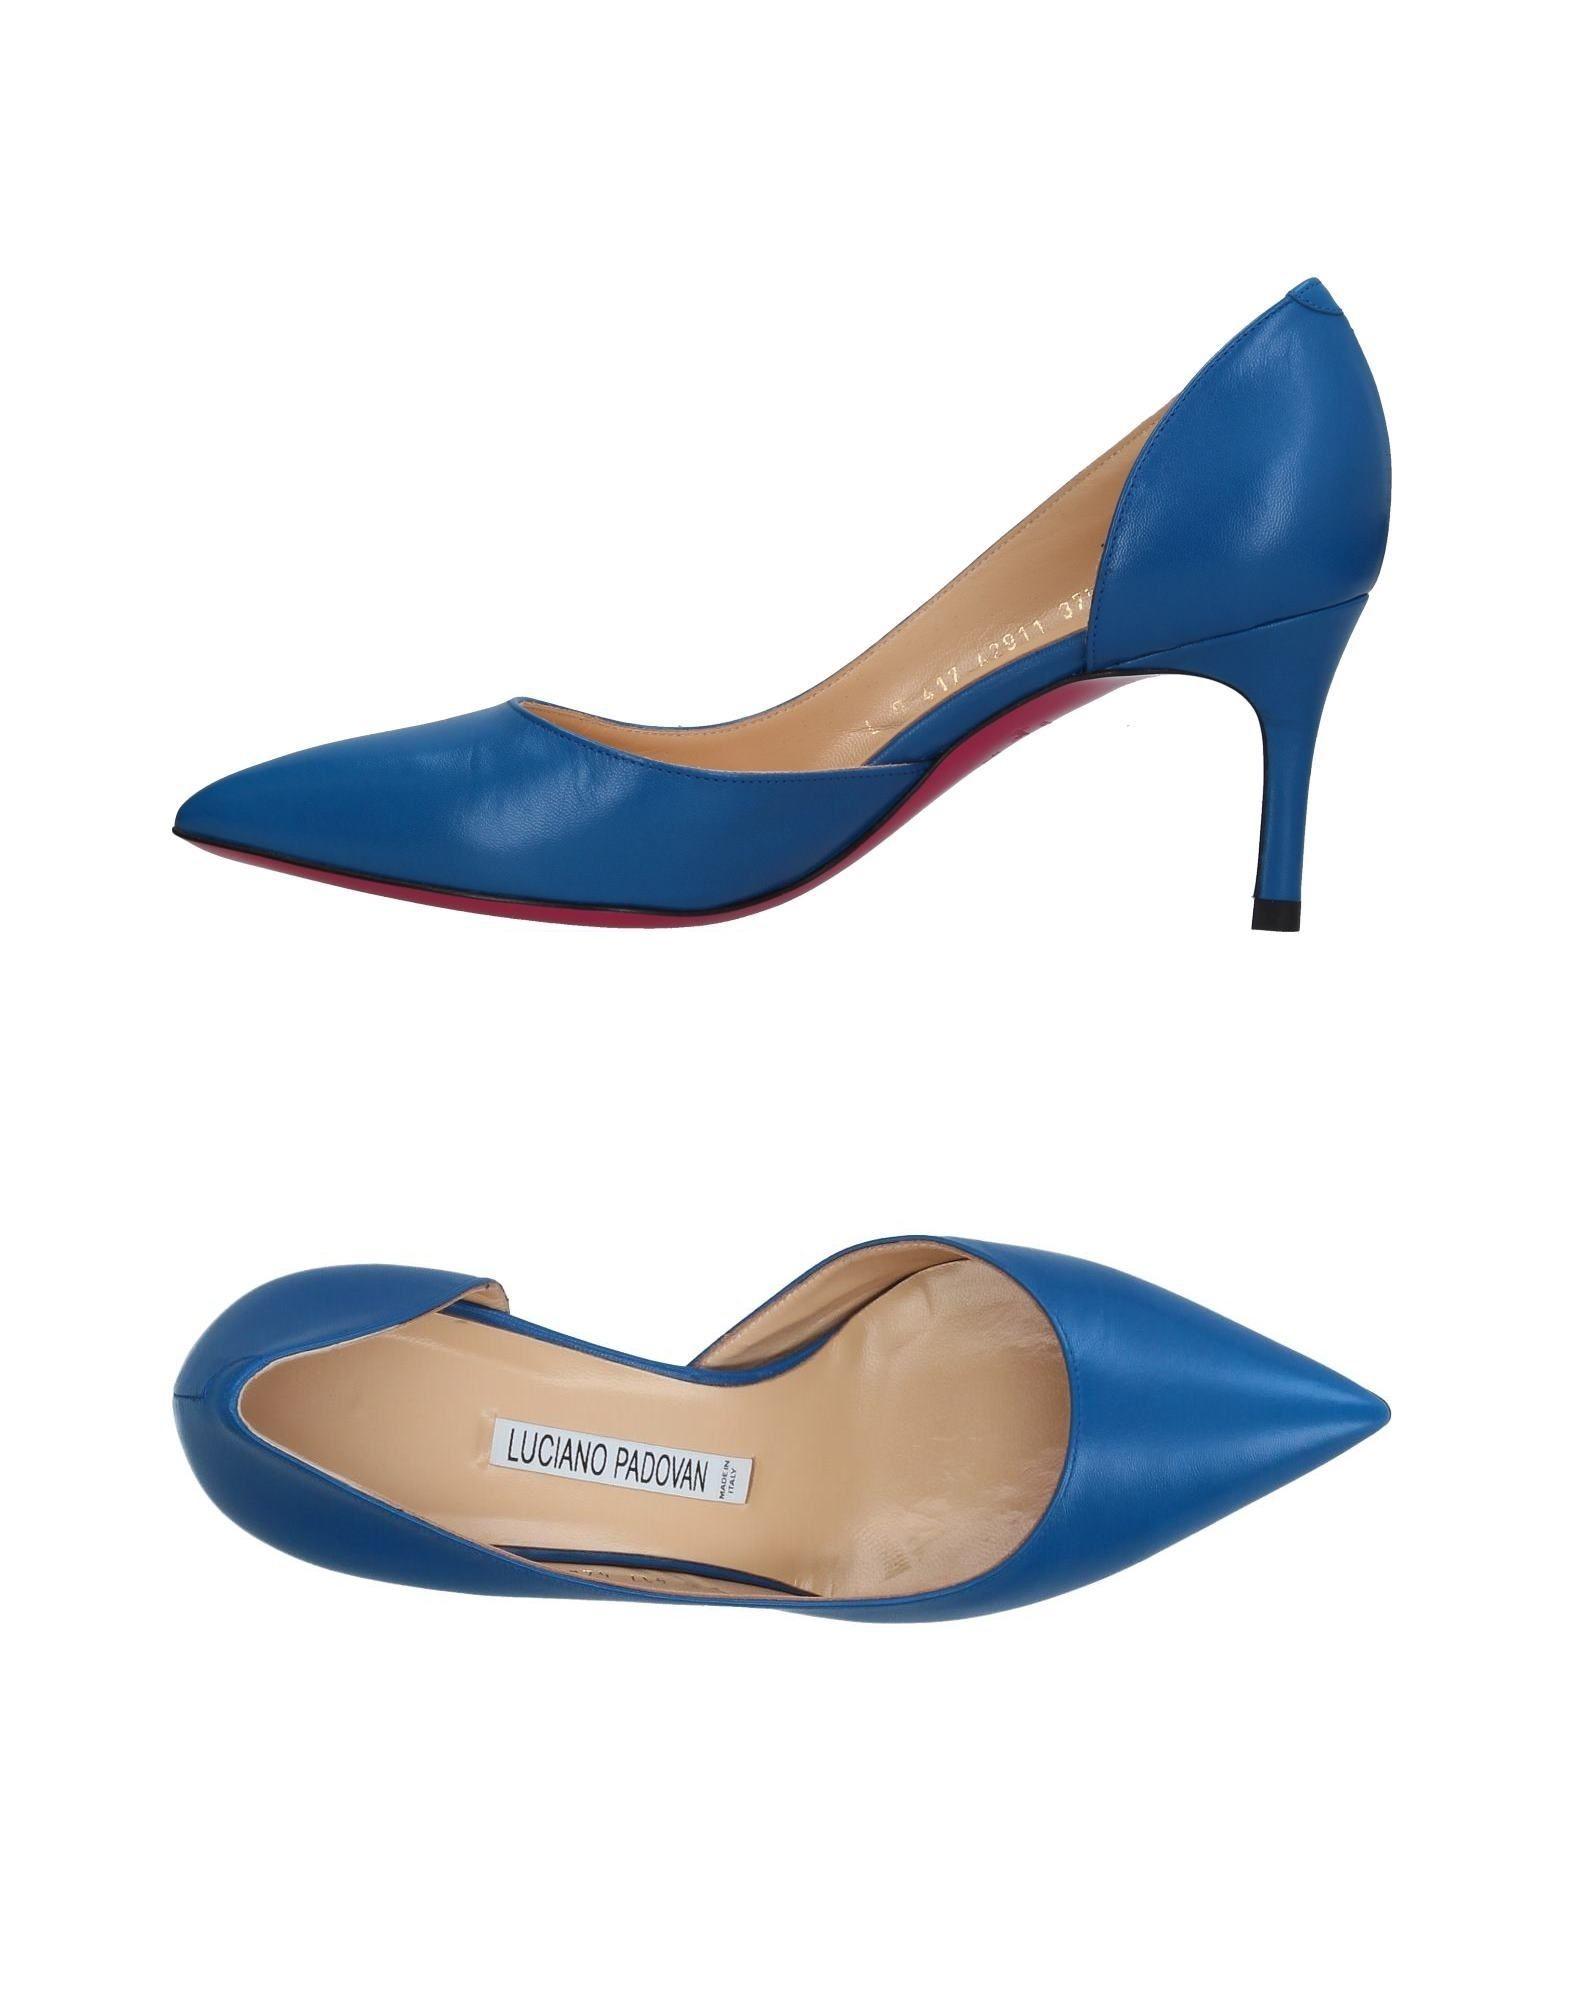 Stilvolle billige Schuhe Luciano Padovan Pumps Damen  11365323LJ